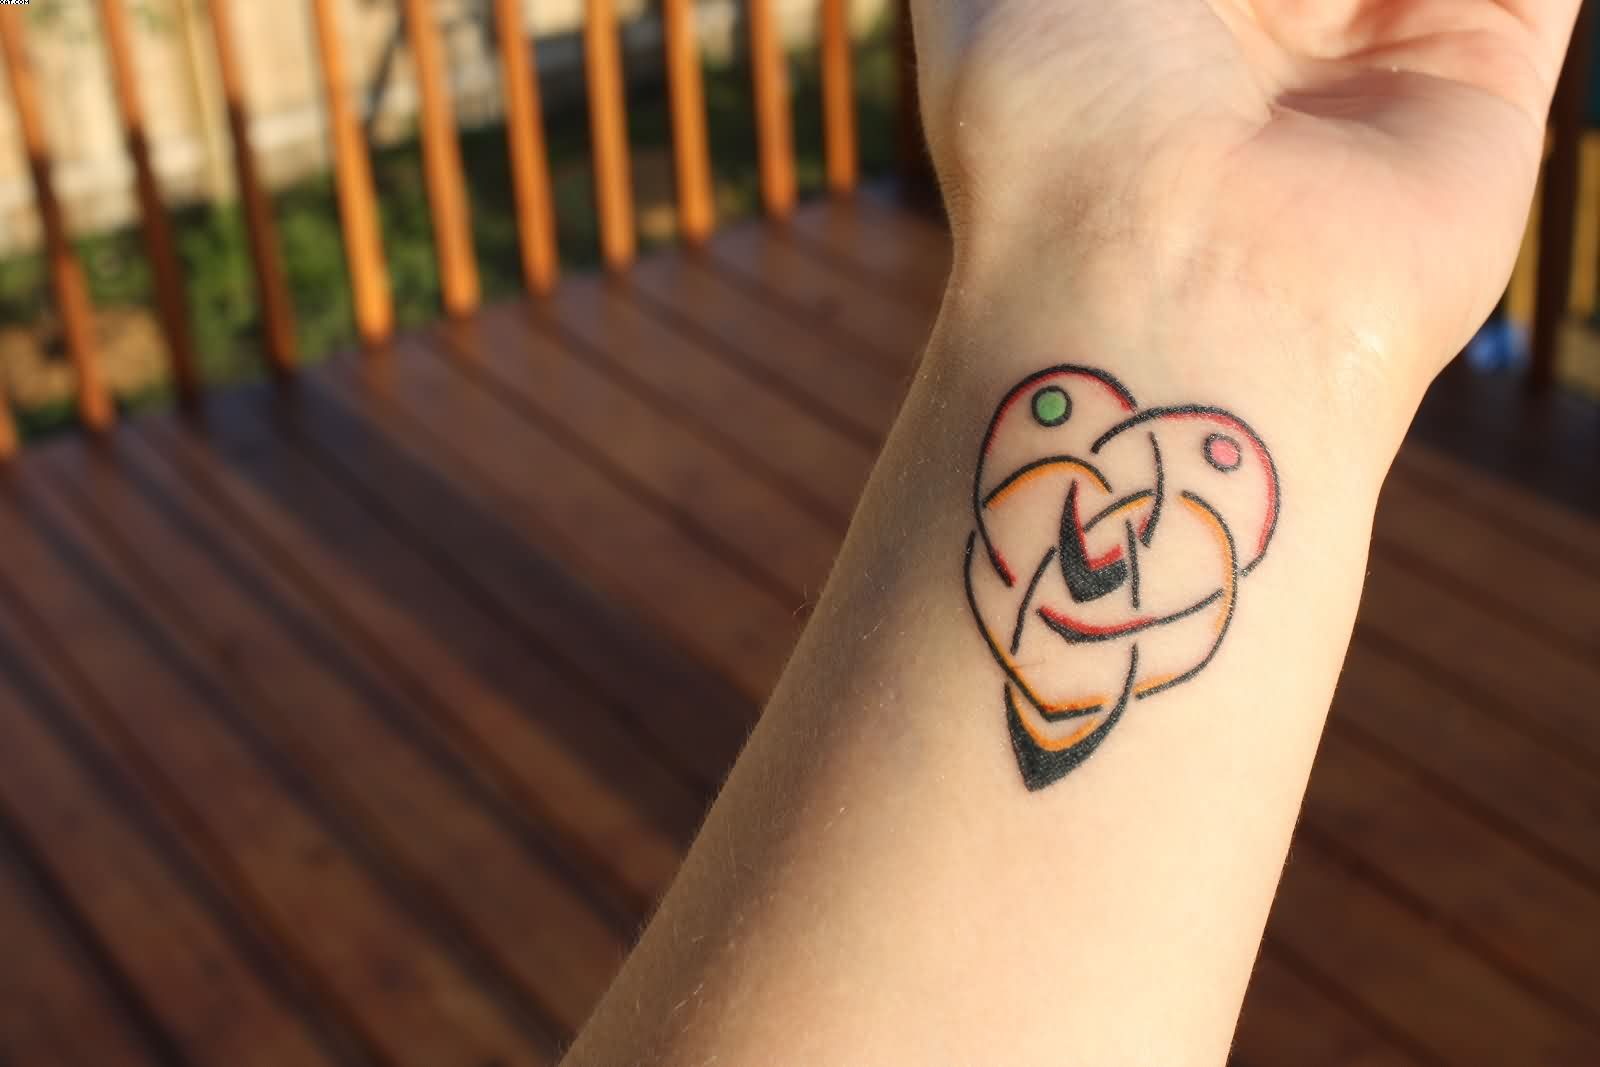 50 awesome wrist tattoo designs images ideas photos picsmine. Black Bedroom Furniture Sets. Home Design Ideas